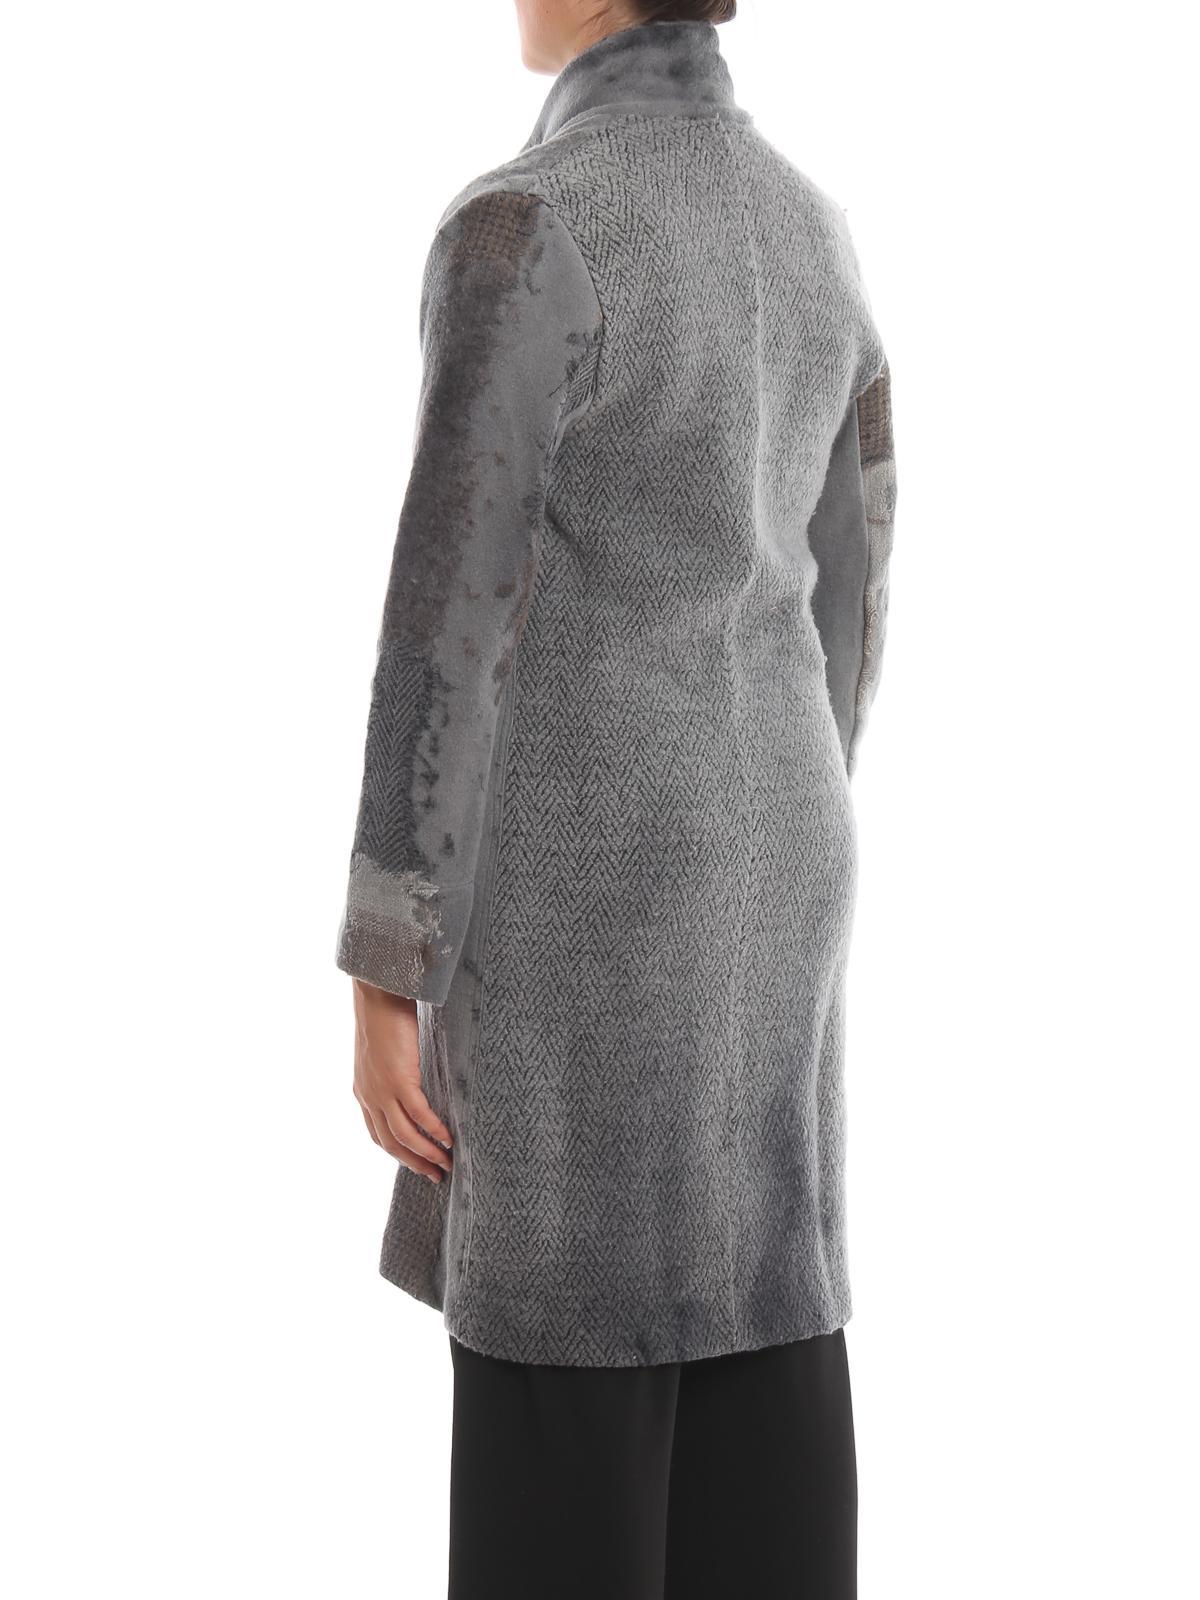 Toi Grau Mäntel Avant Knielanger Damen Mantel Rabatt qzMpUSVG